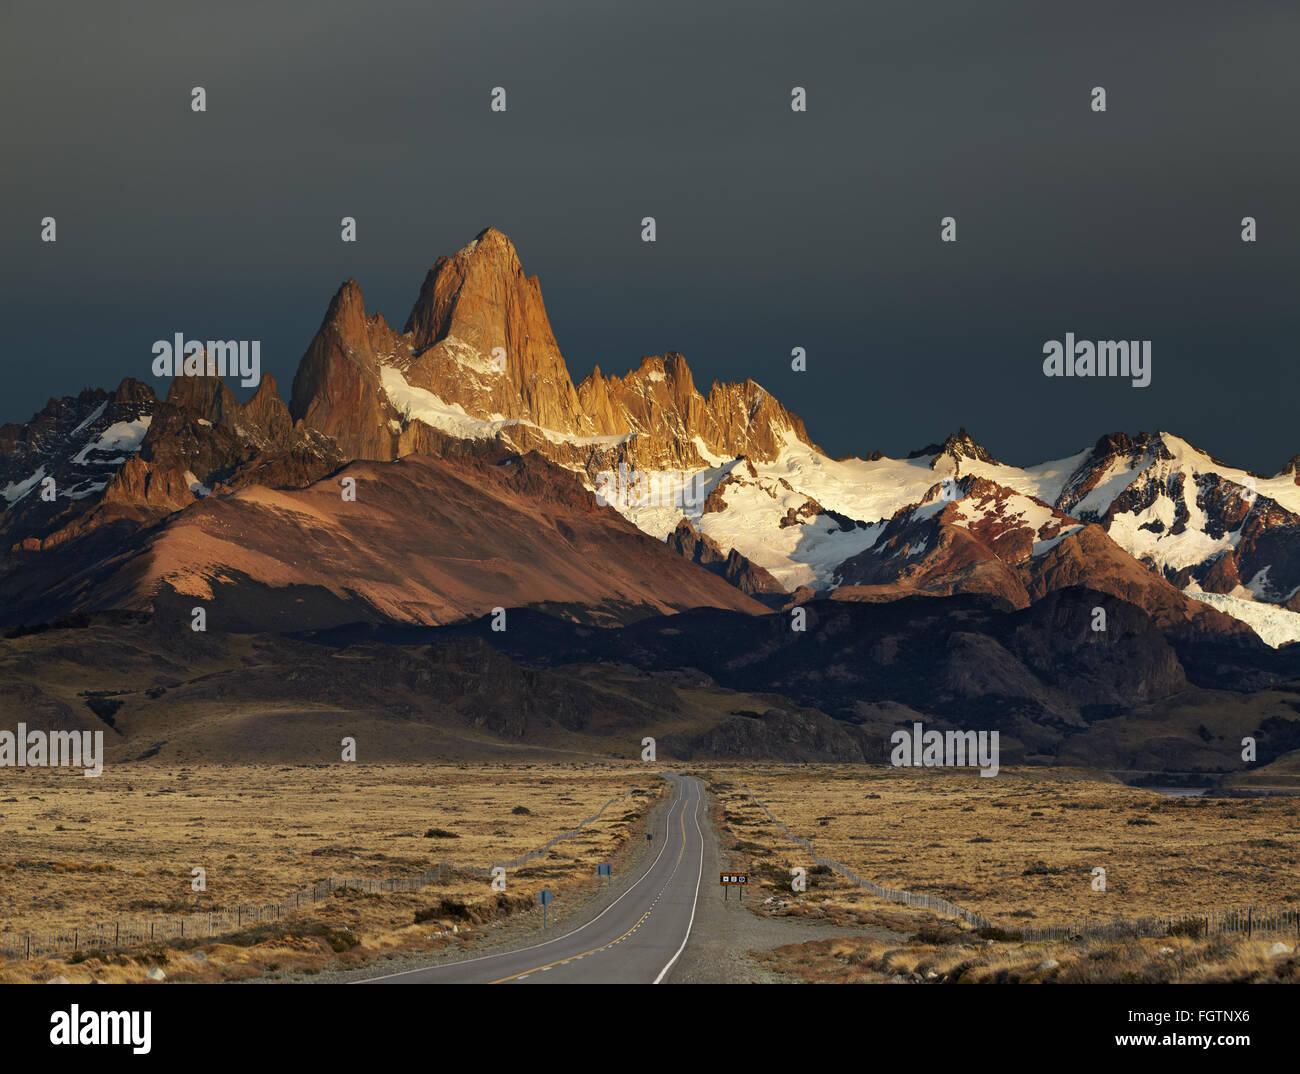 Mount Fitz Roy at sunrise. Los Glaciares National Park, Patagonia, Argentina - Stock Image